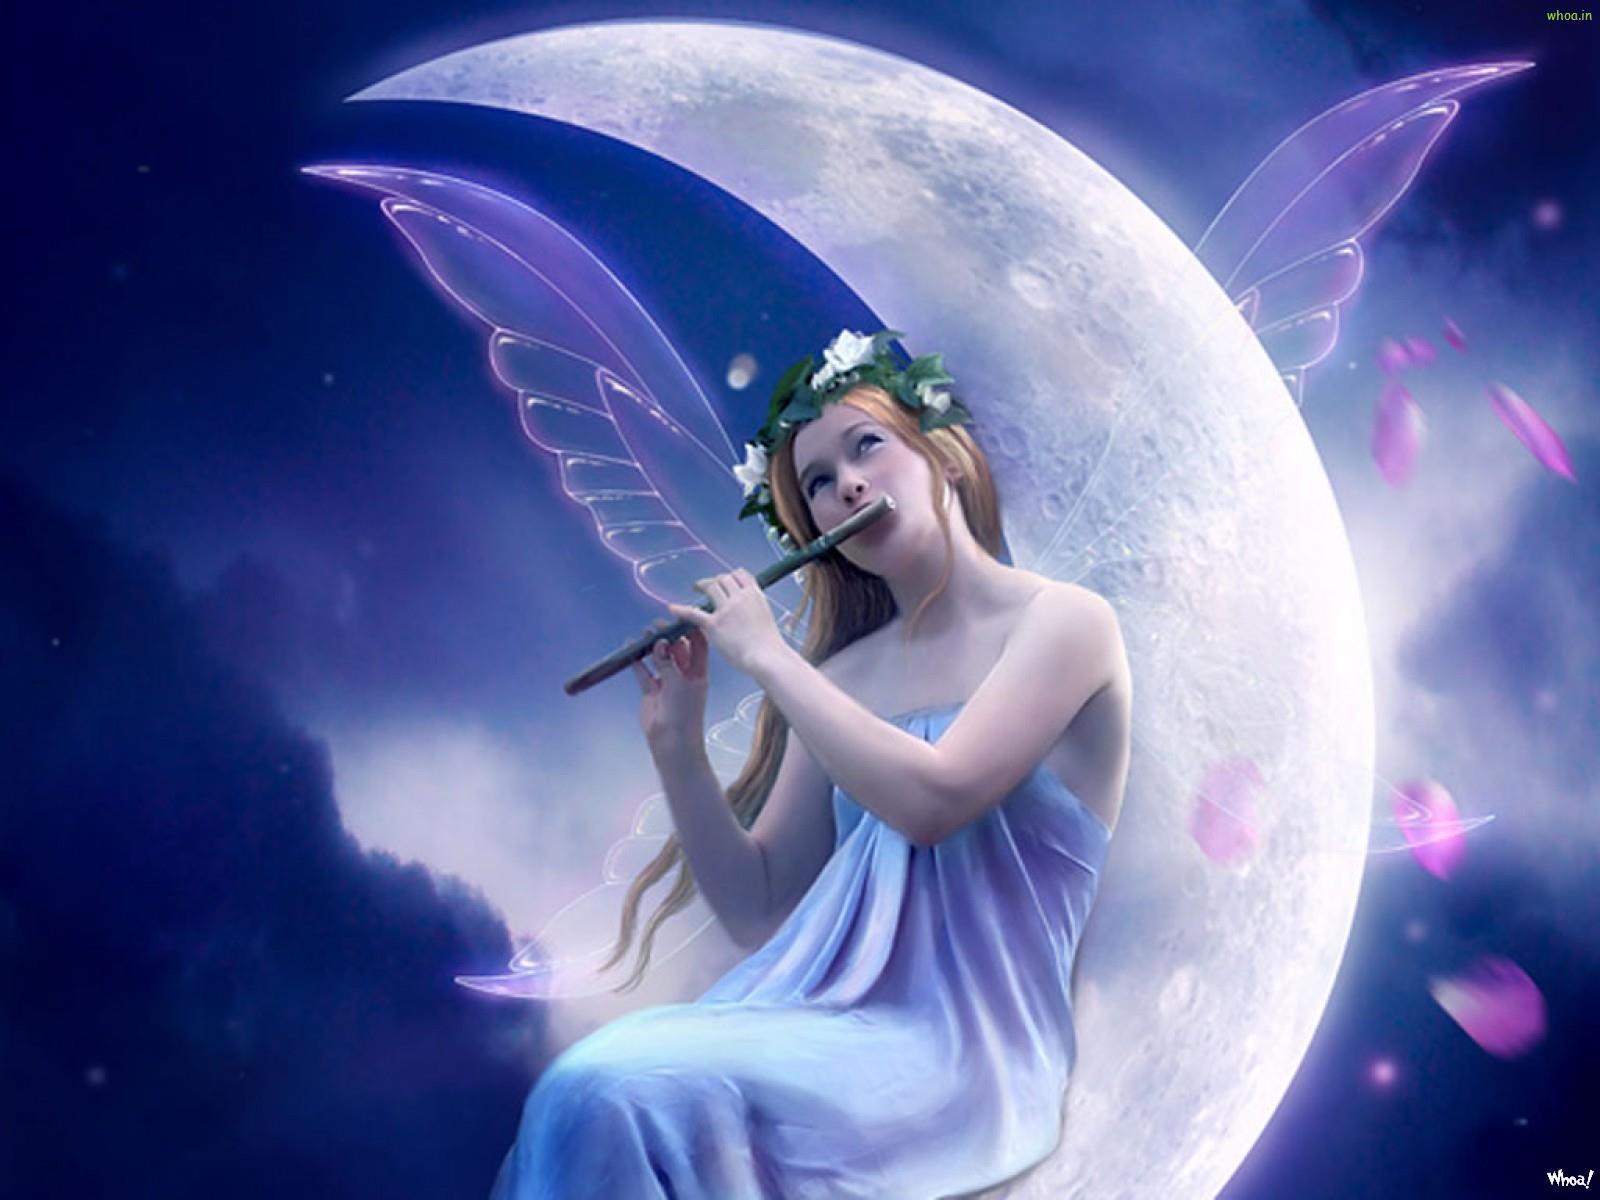 ФЕЯ Fantasy-mythical-girls-hd-wallpaper-54